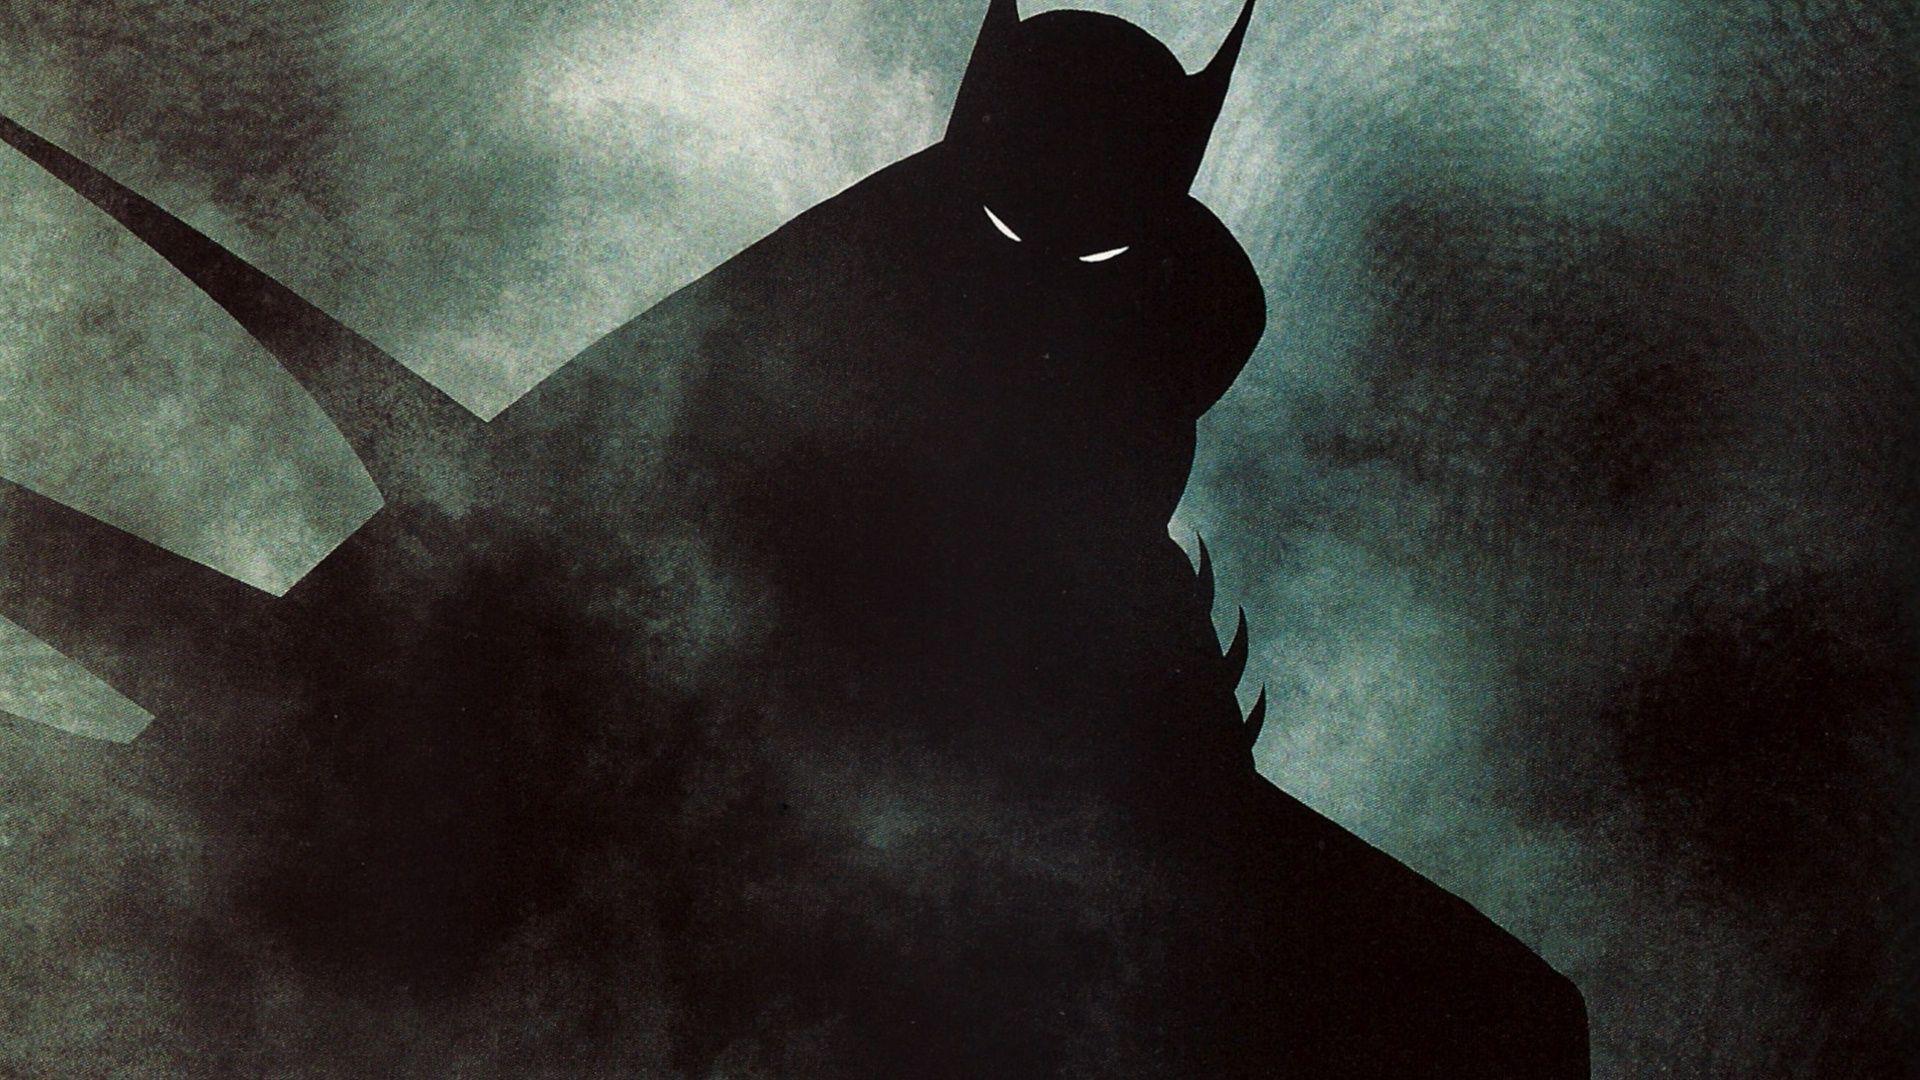 Hq 3d Wallpapers Free Download Batman Backgrounds New Free Download Pixelstalk Net